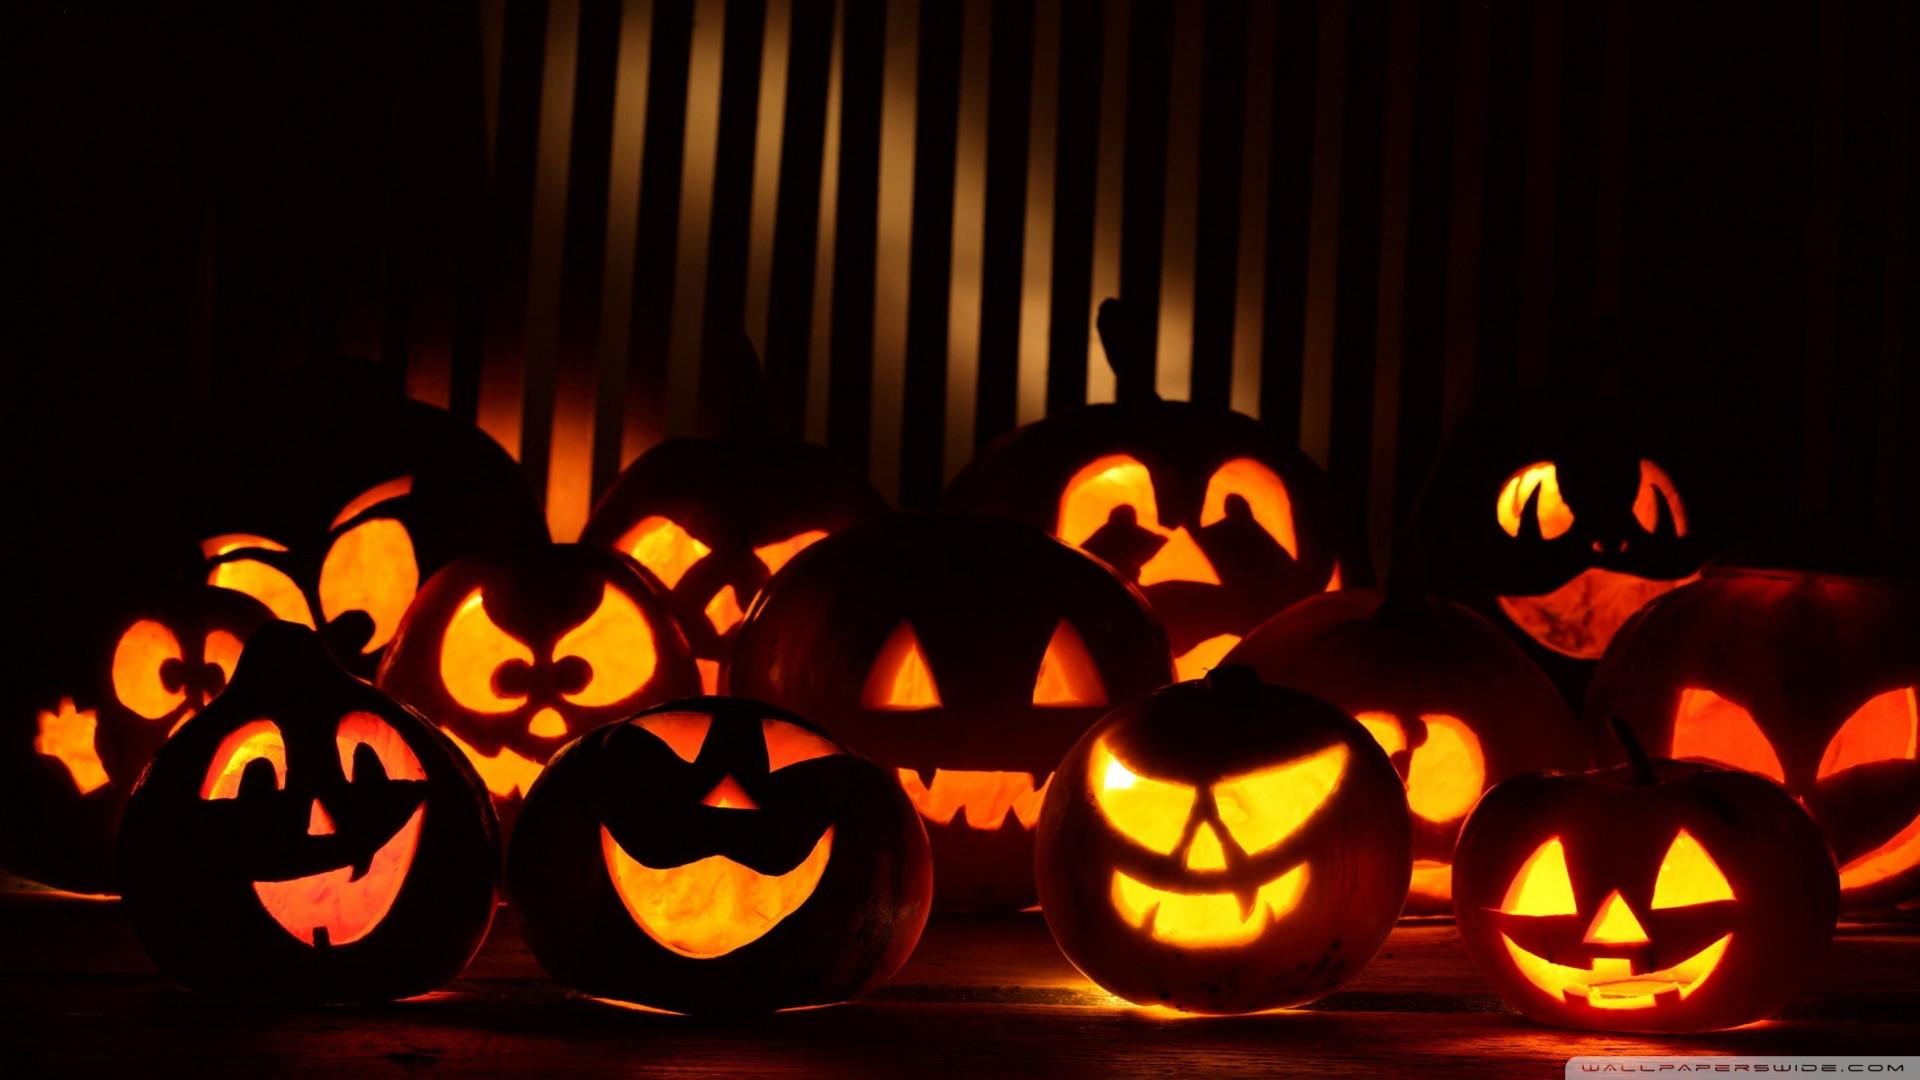 halloween, hd wallpapers, hd halloween, hd images, halloween hd, hd  halloween